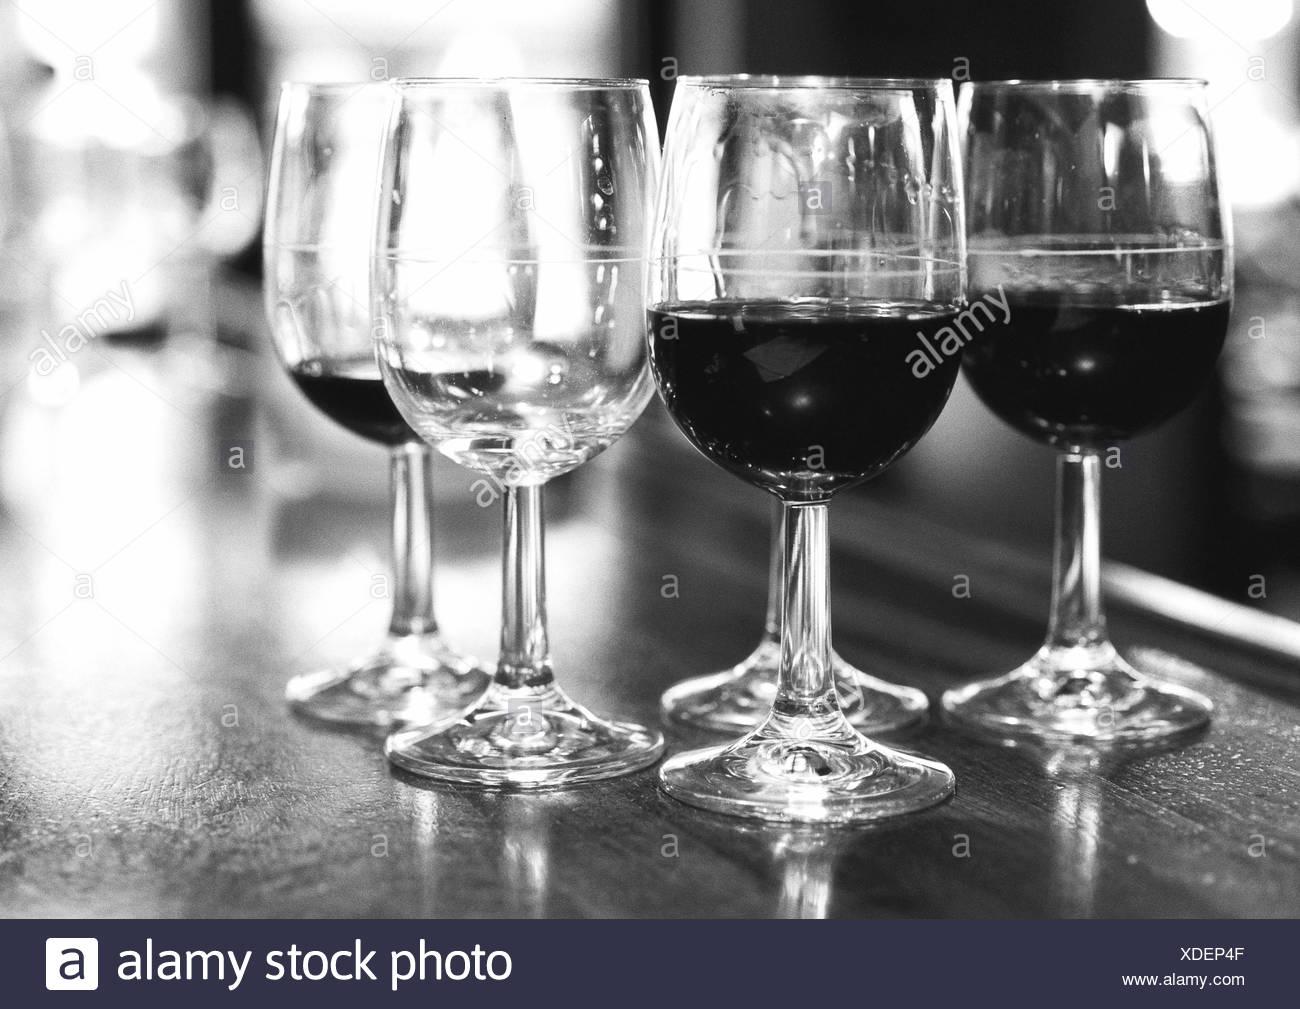 Empty Glasses Bar Counter Stockfotos & Empty Glasses Bar Counter ...